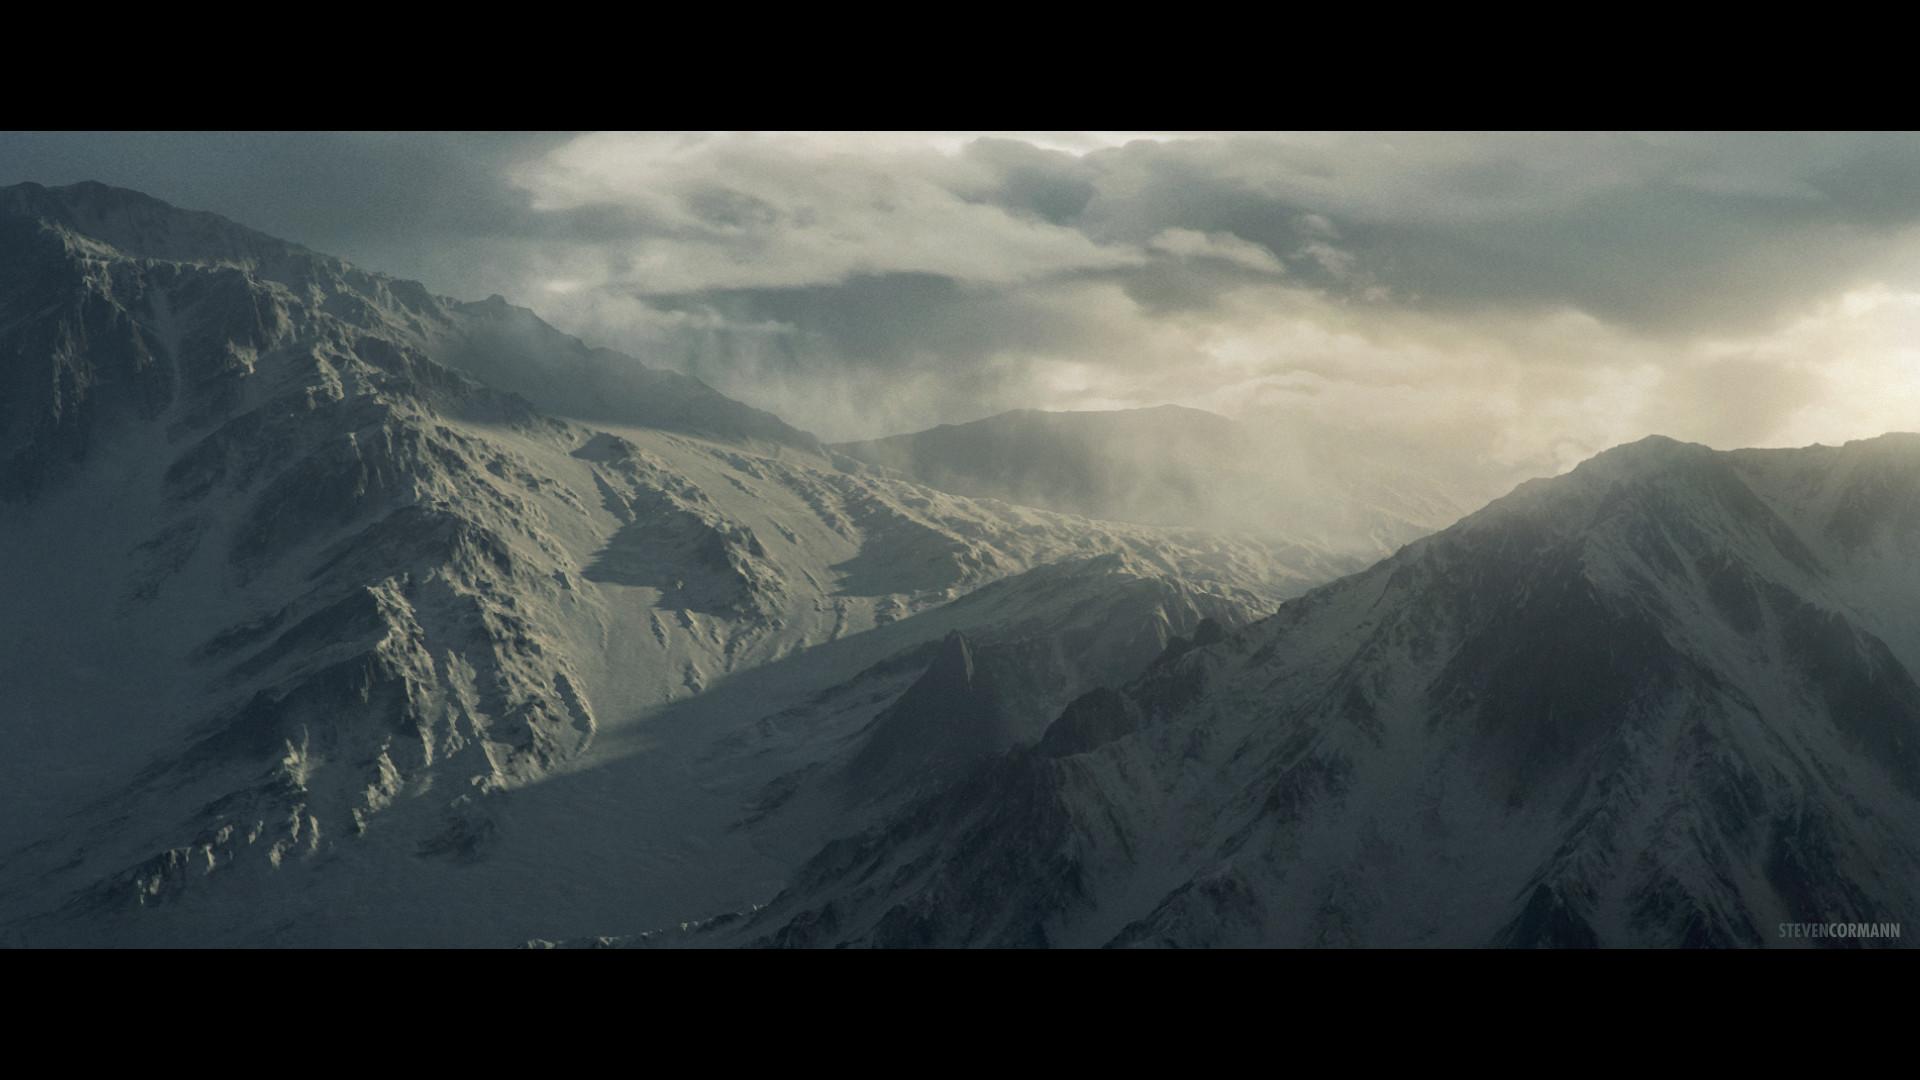 Steven cormann landscape02